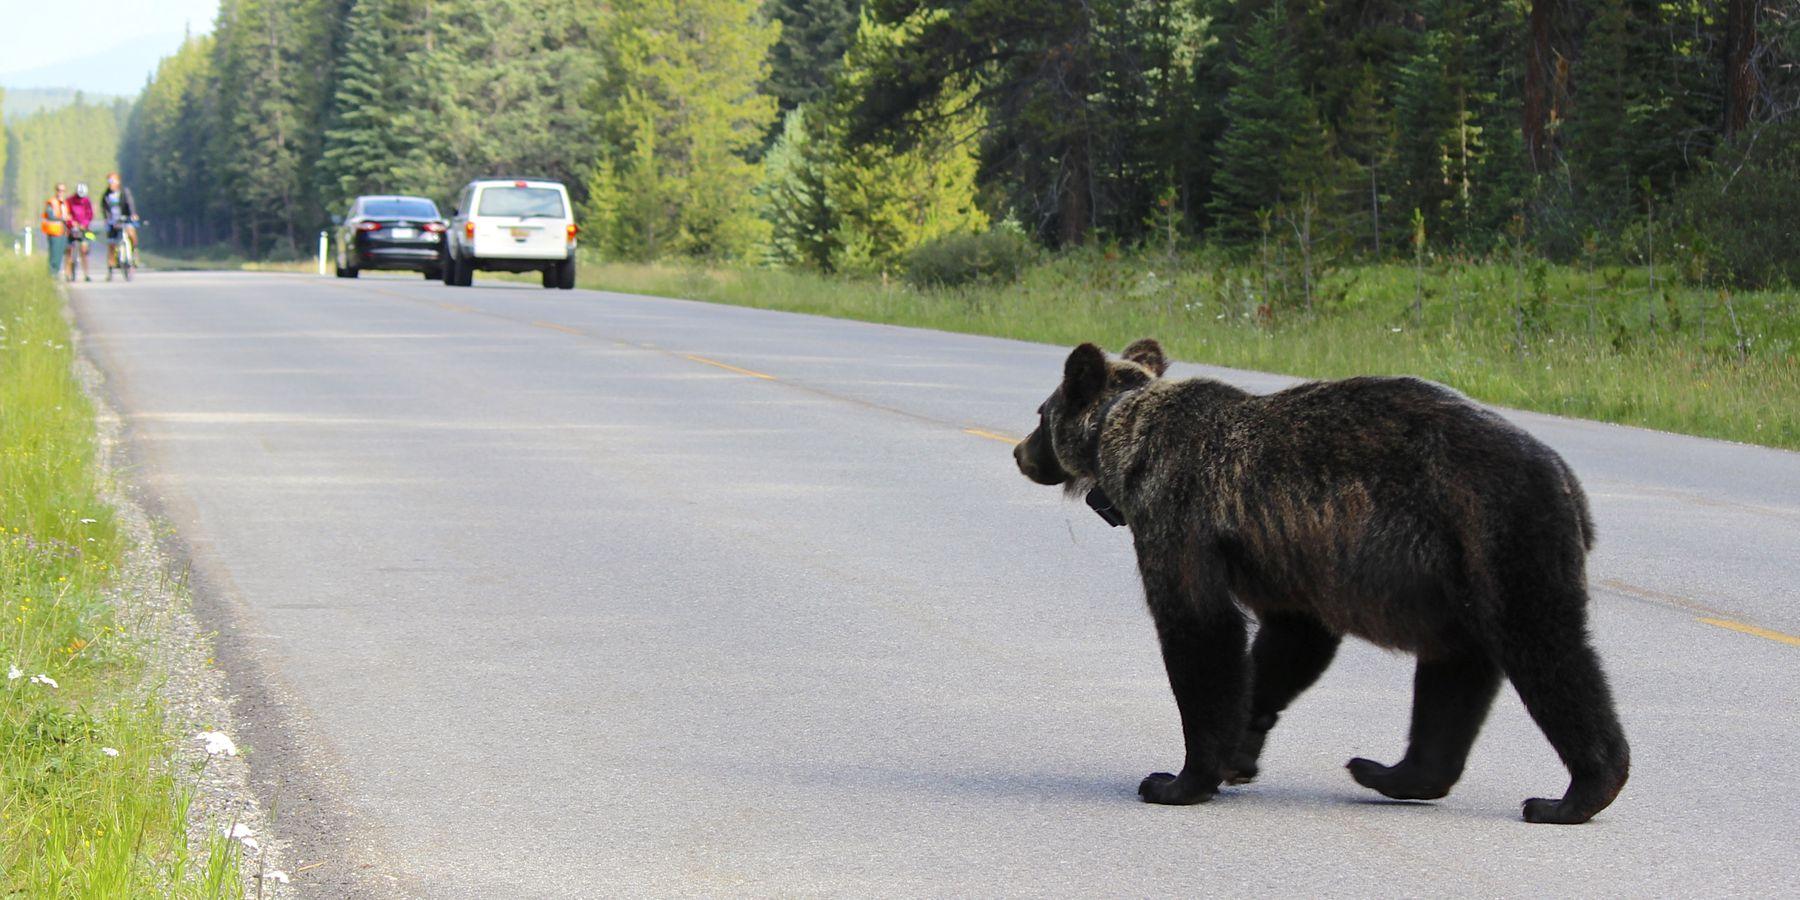 Bow Valley Parkway - Banff National Park - Alberta - Canada - Doets Reizen